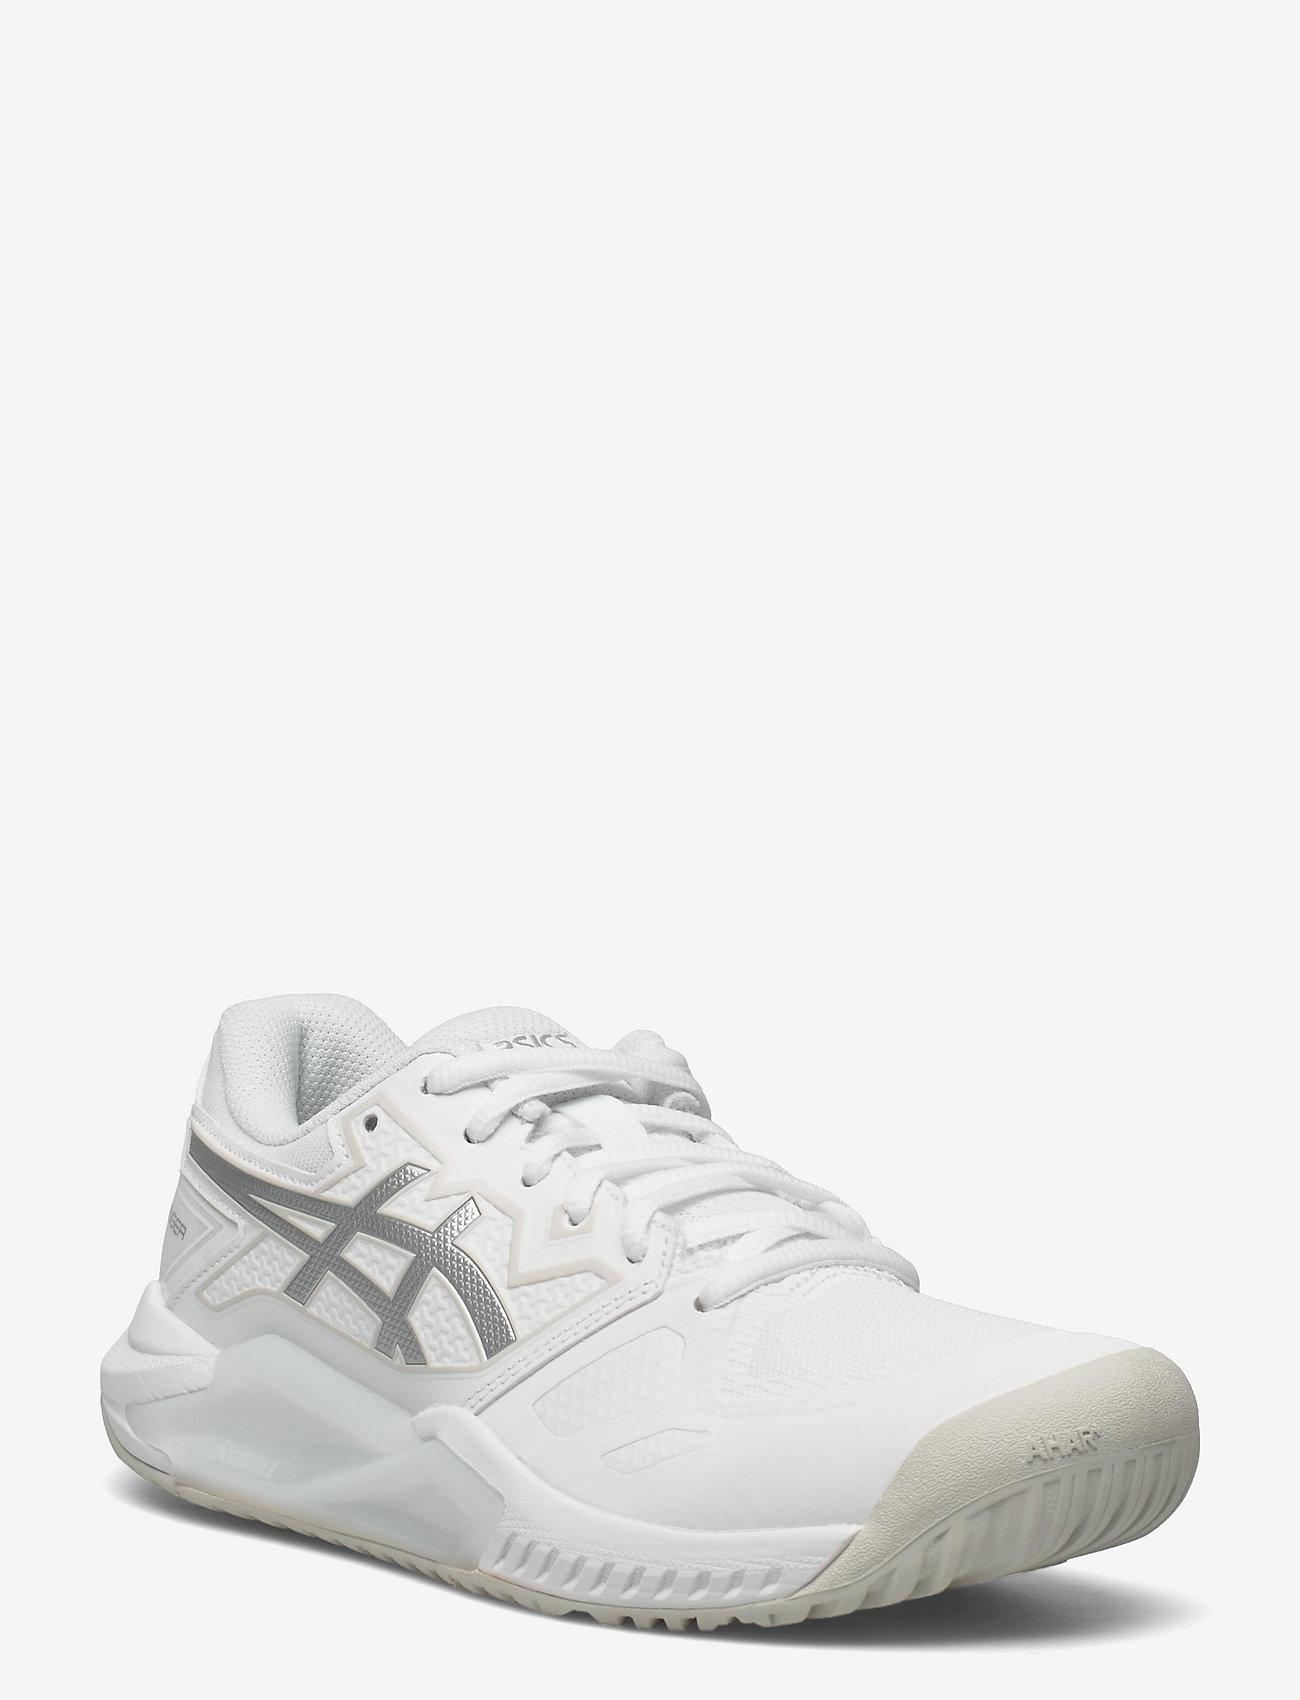 Asics - GEL-CHALLENGER 13 - ketsjersportsko - white/pure silver - 0